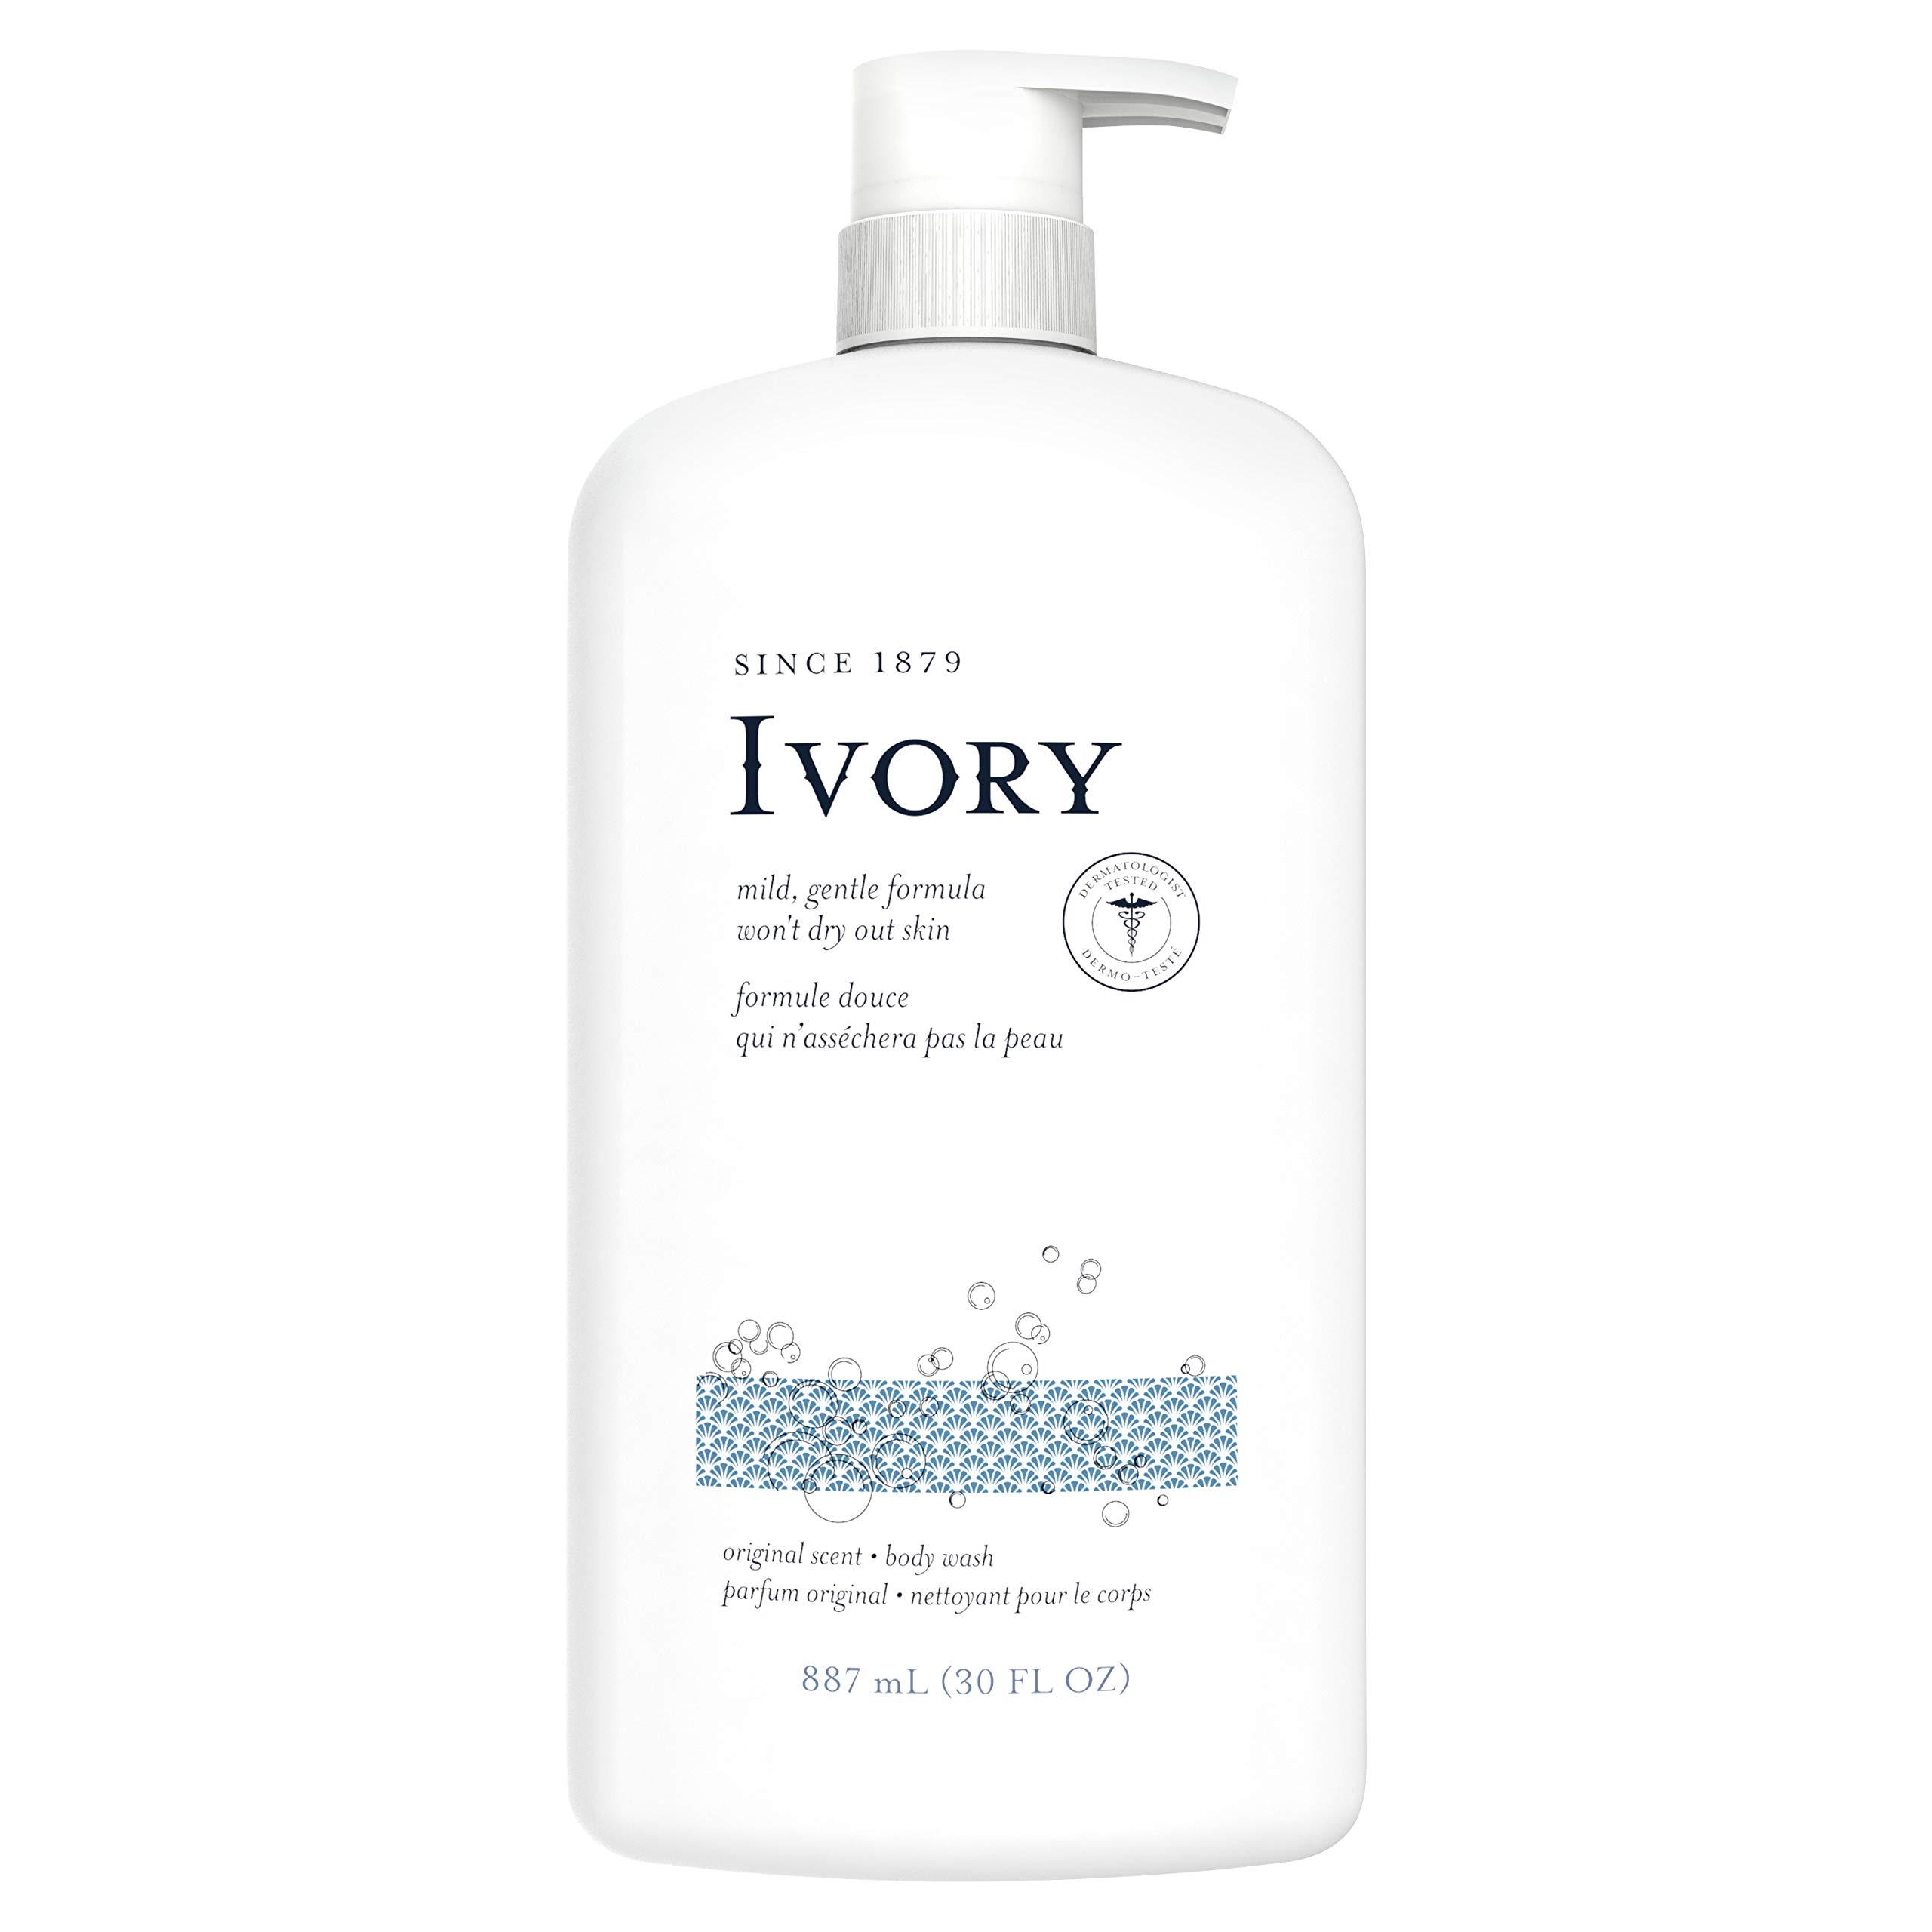 Ivory Body Wash Original Scent 30 oz, Pack of 4